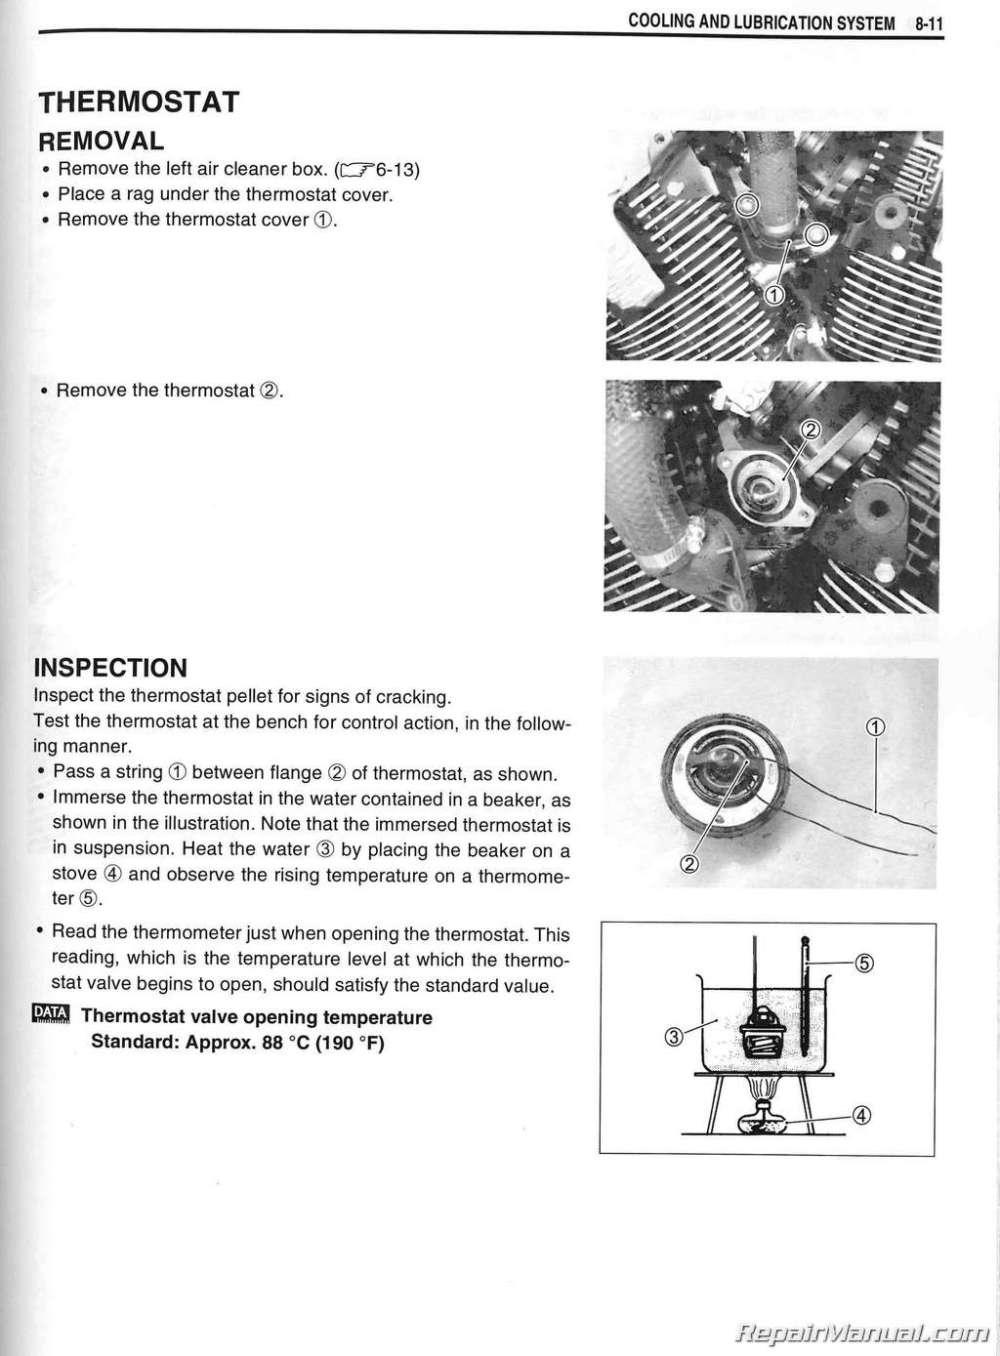 medium resolution of m109r wiring diagram wiring library 2006 2016 suzuki vzr1800 m109 boulevard motorcycle service manual m109r wiring